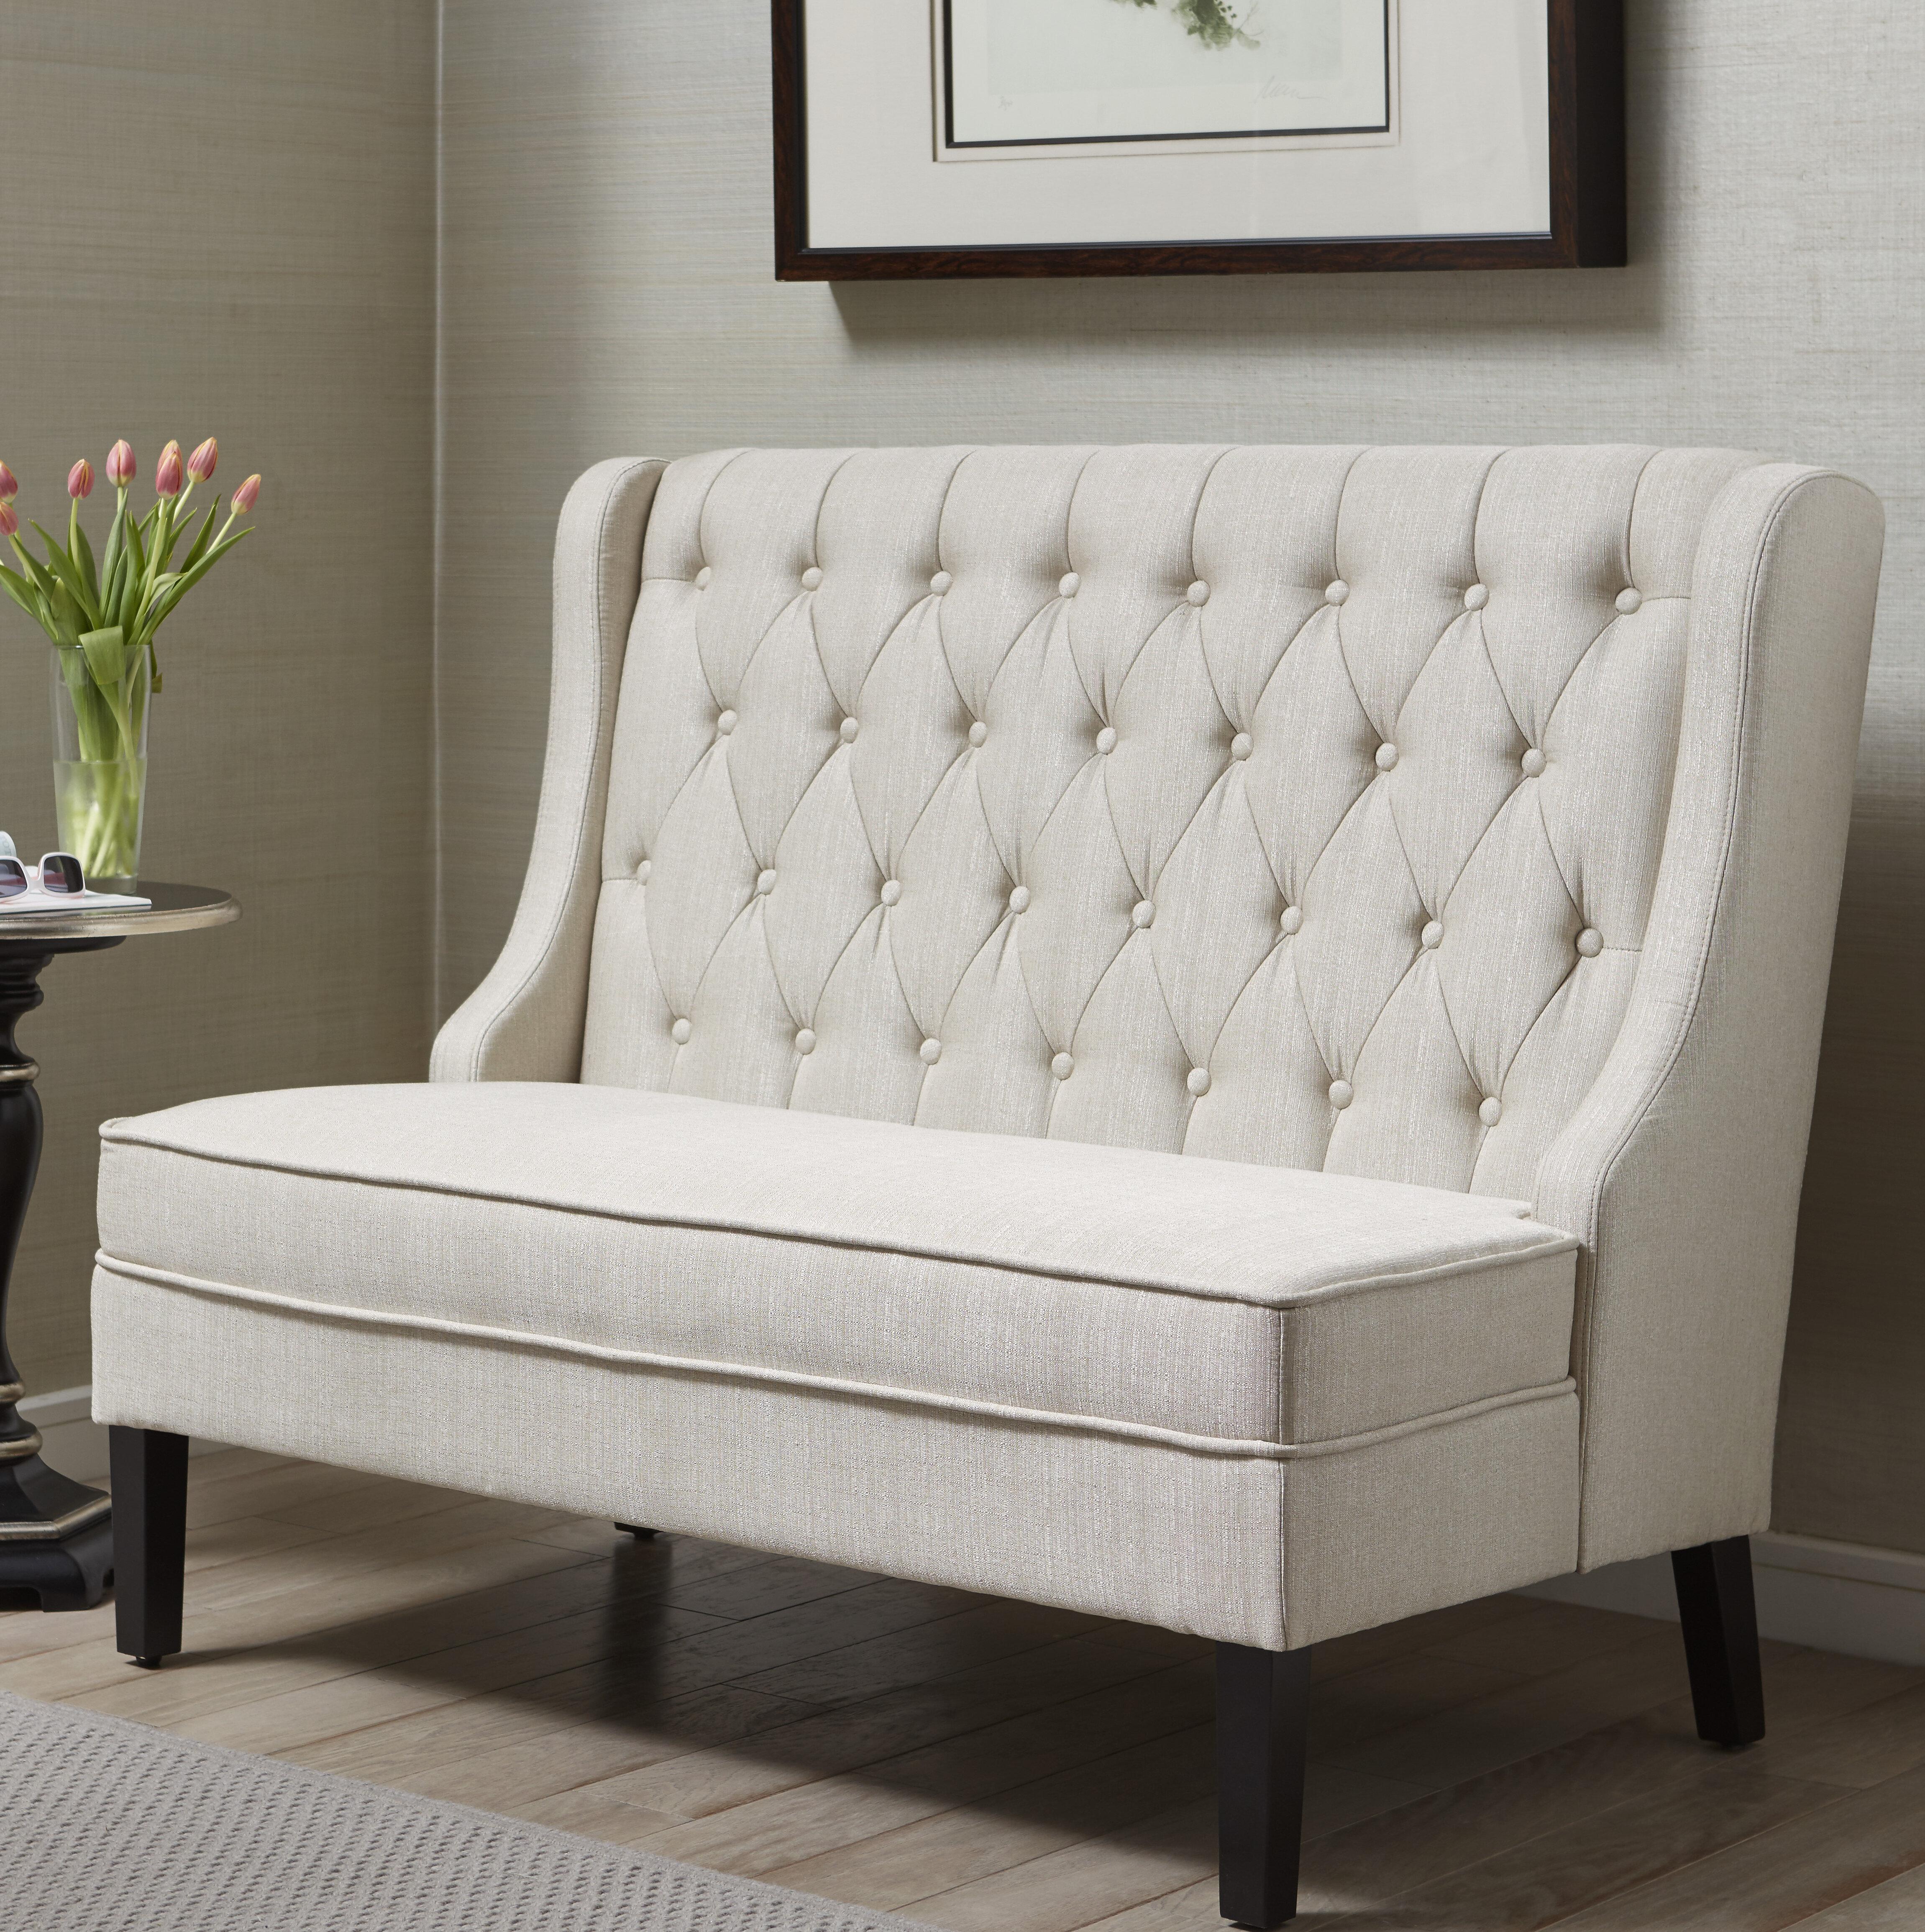 Three posts moriah upholstered bench reviews wayfair